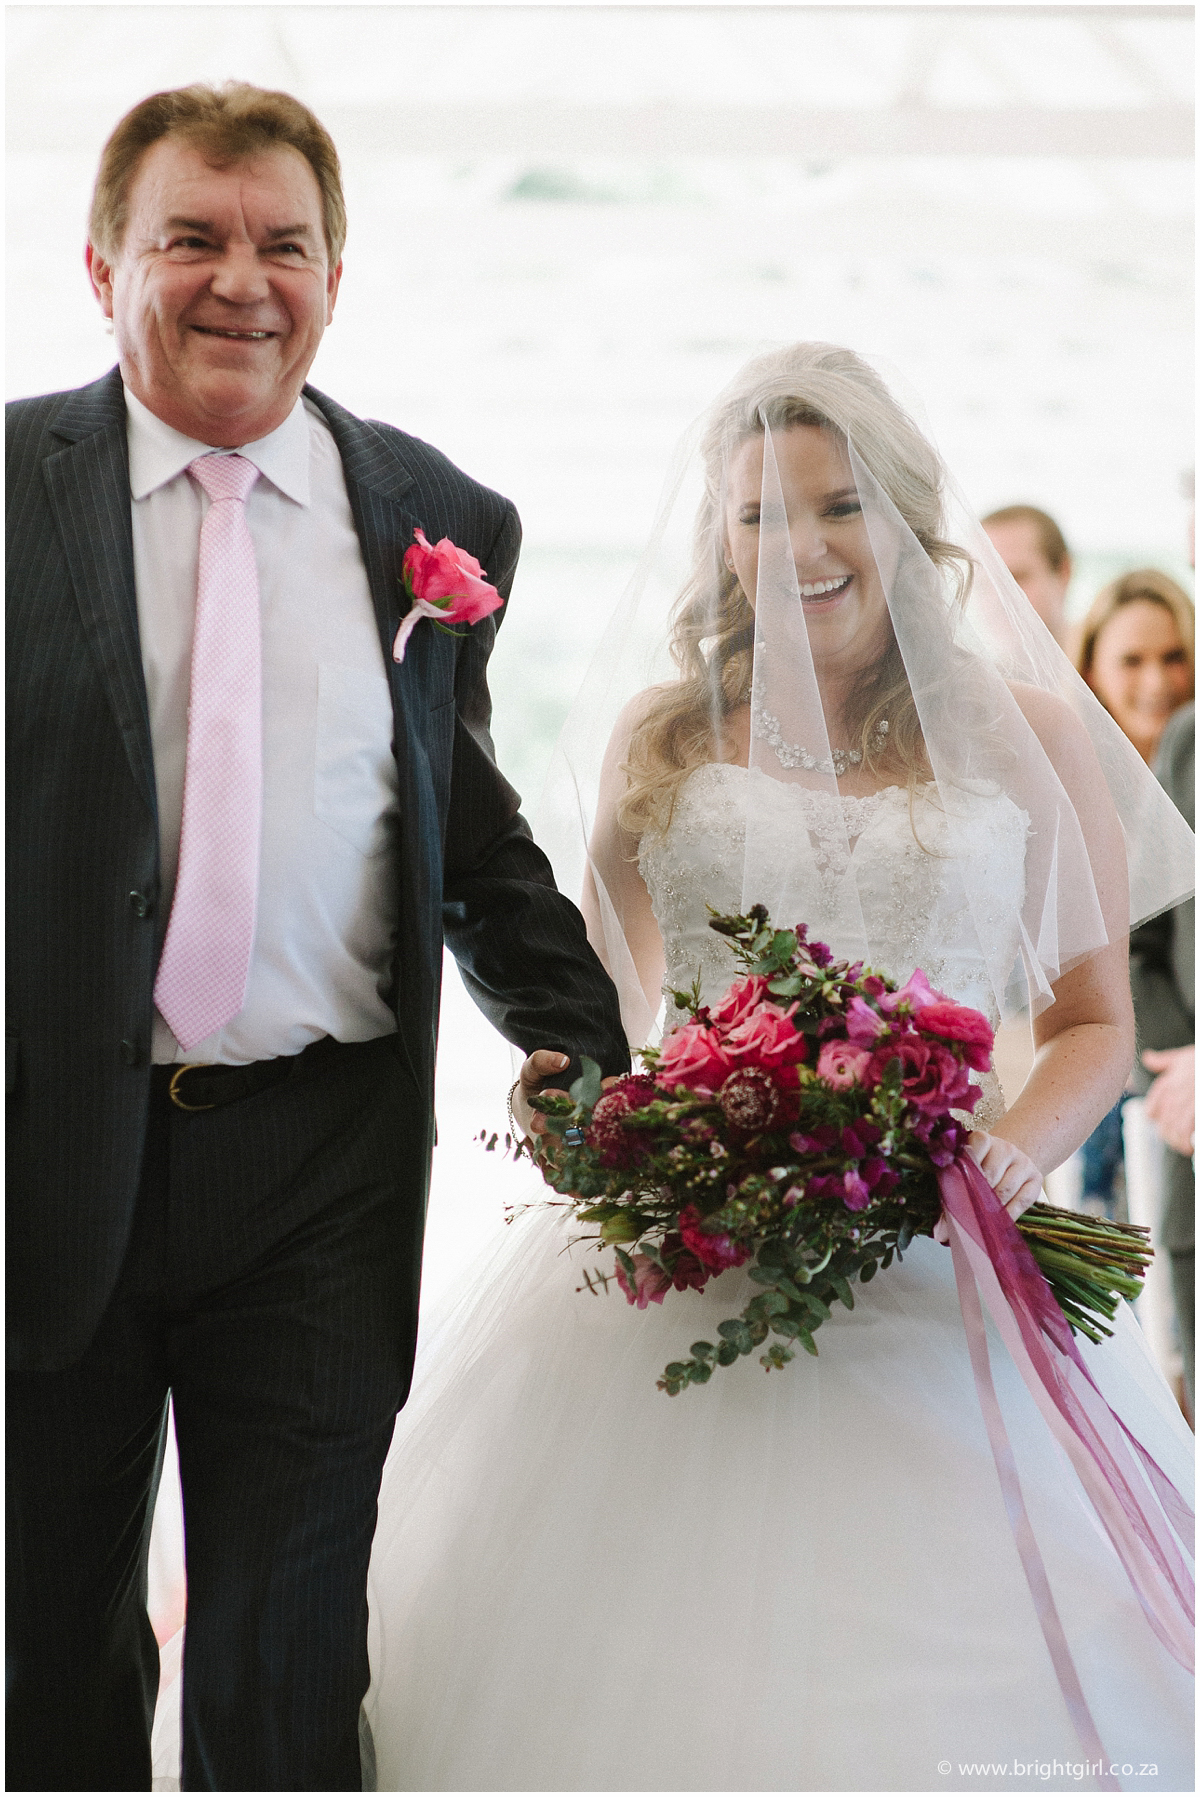 talloula-wedding-tarryn-chris-24